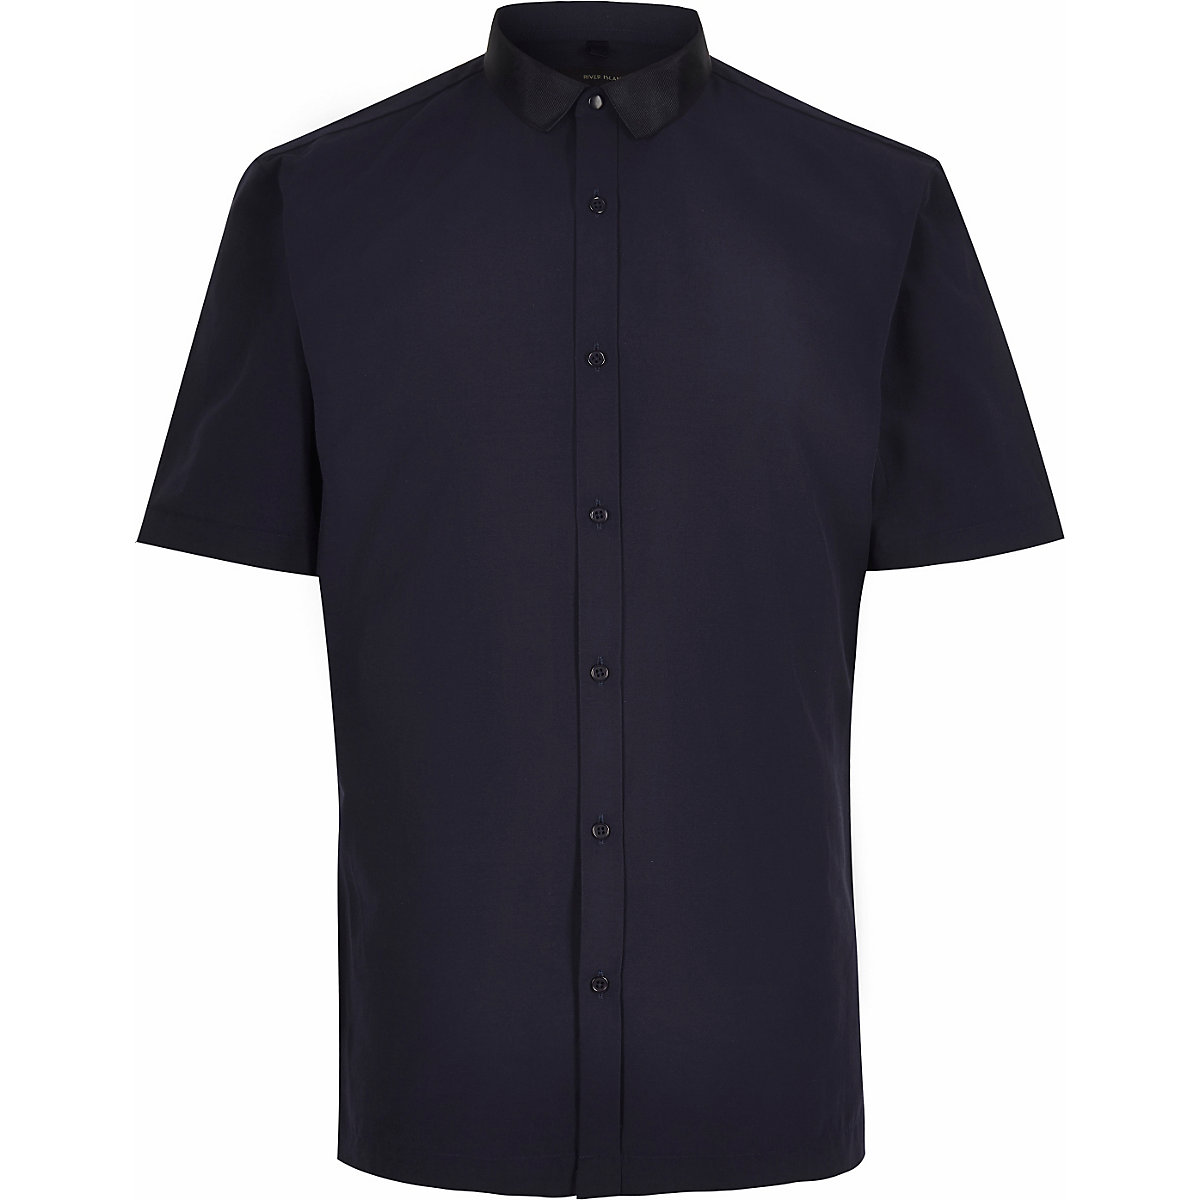 Navy grosgrain collar short sleeve shirt